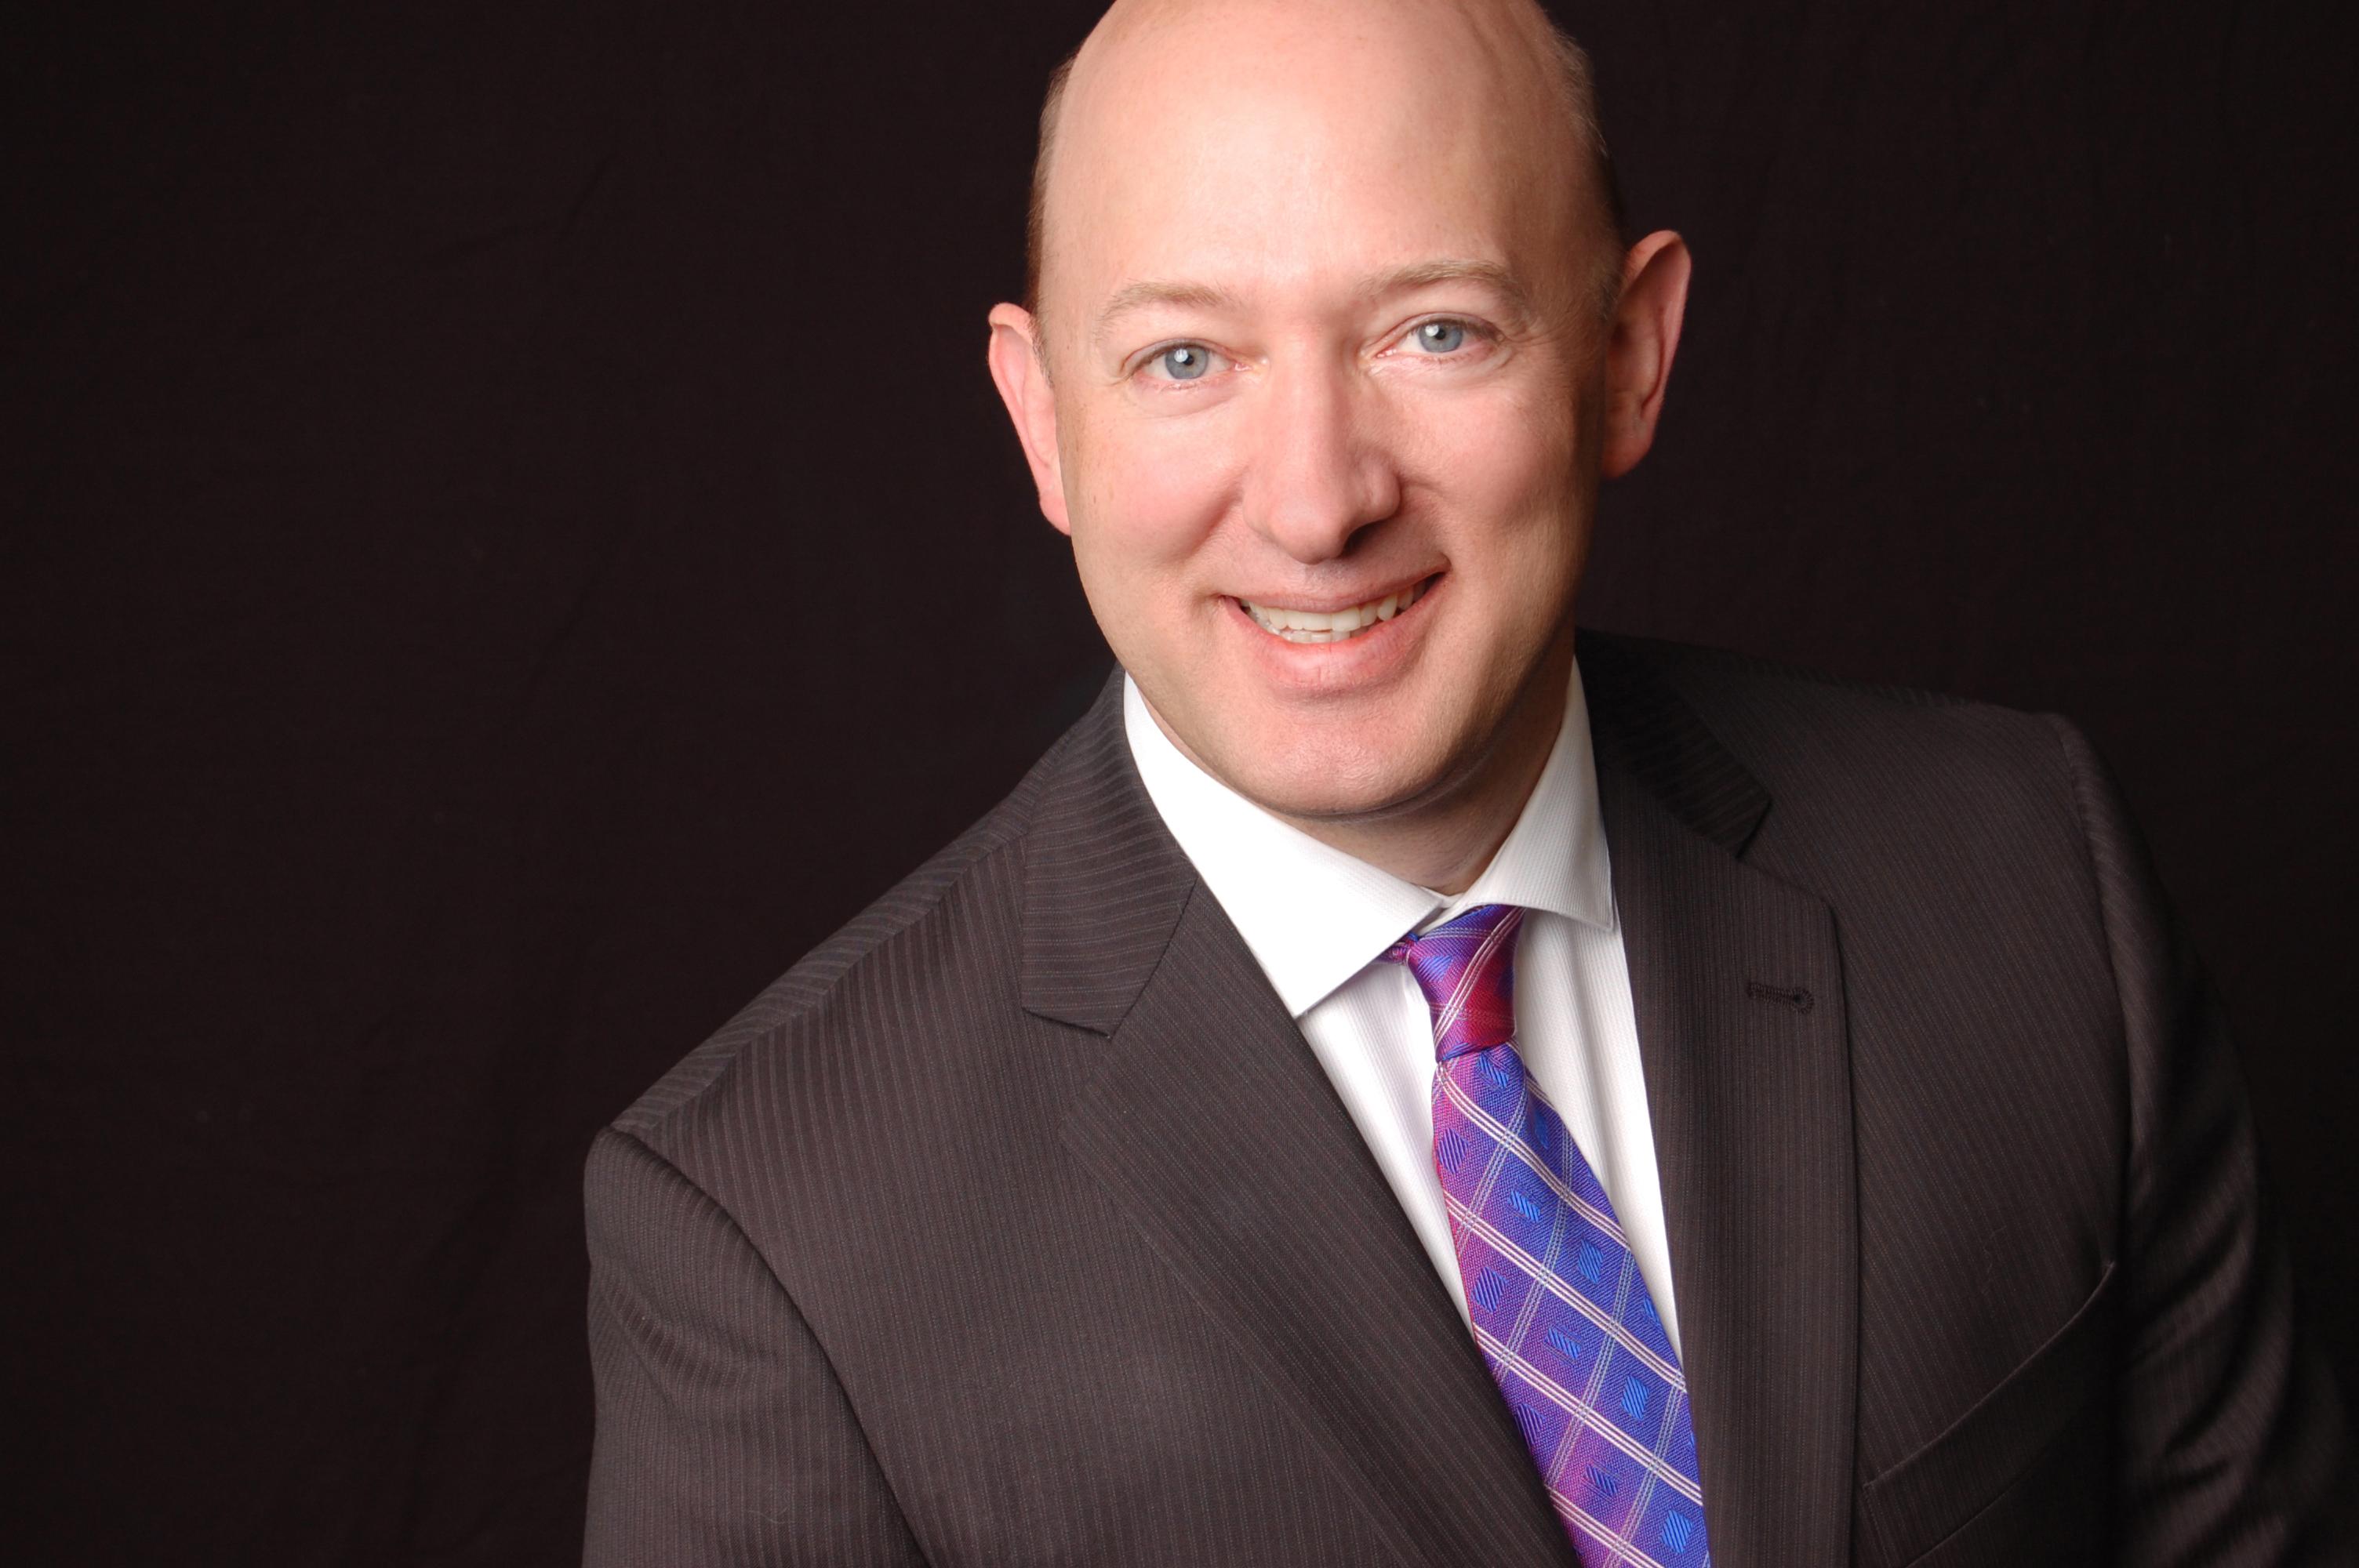 Keelan McCamey, Owner/CEO